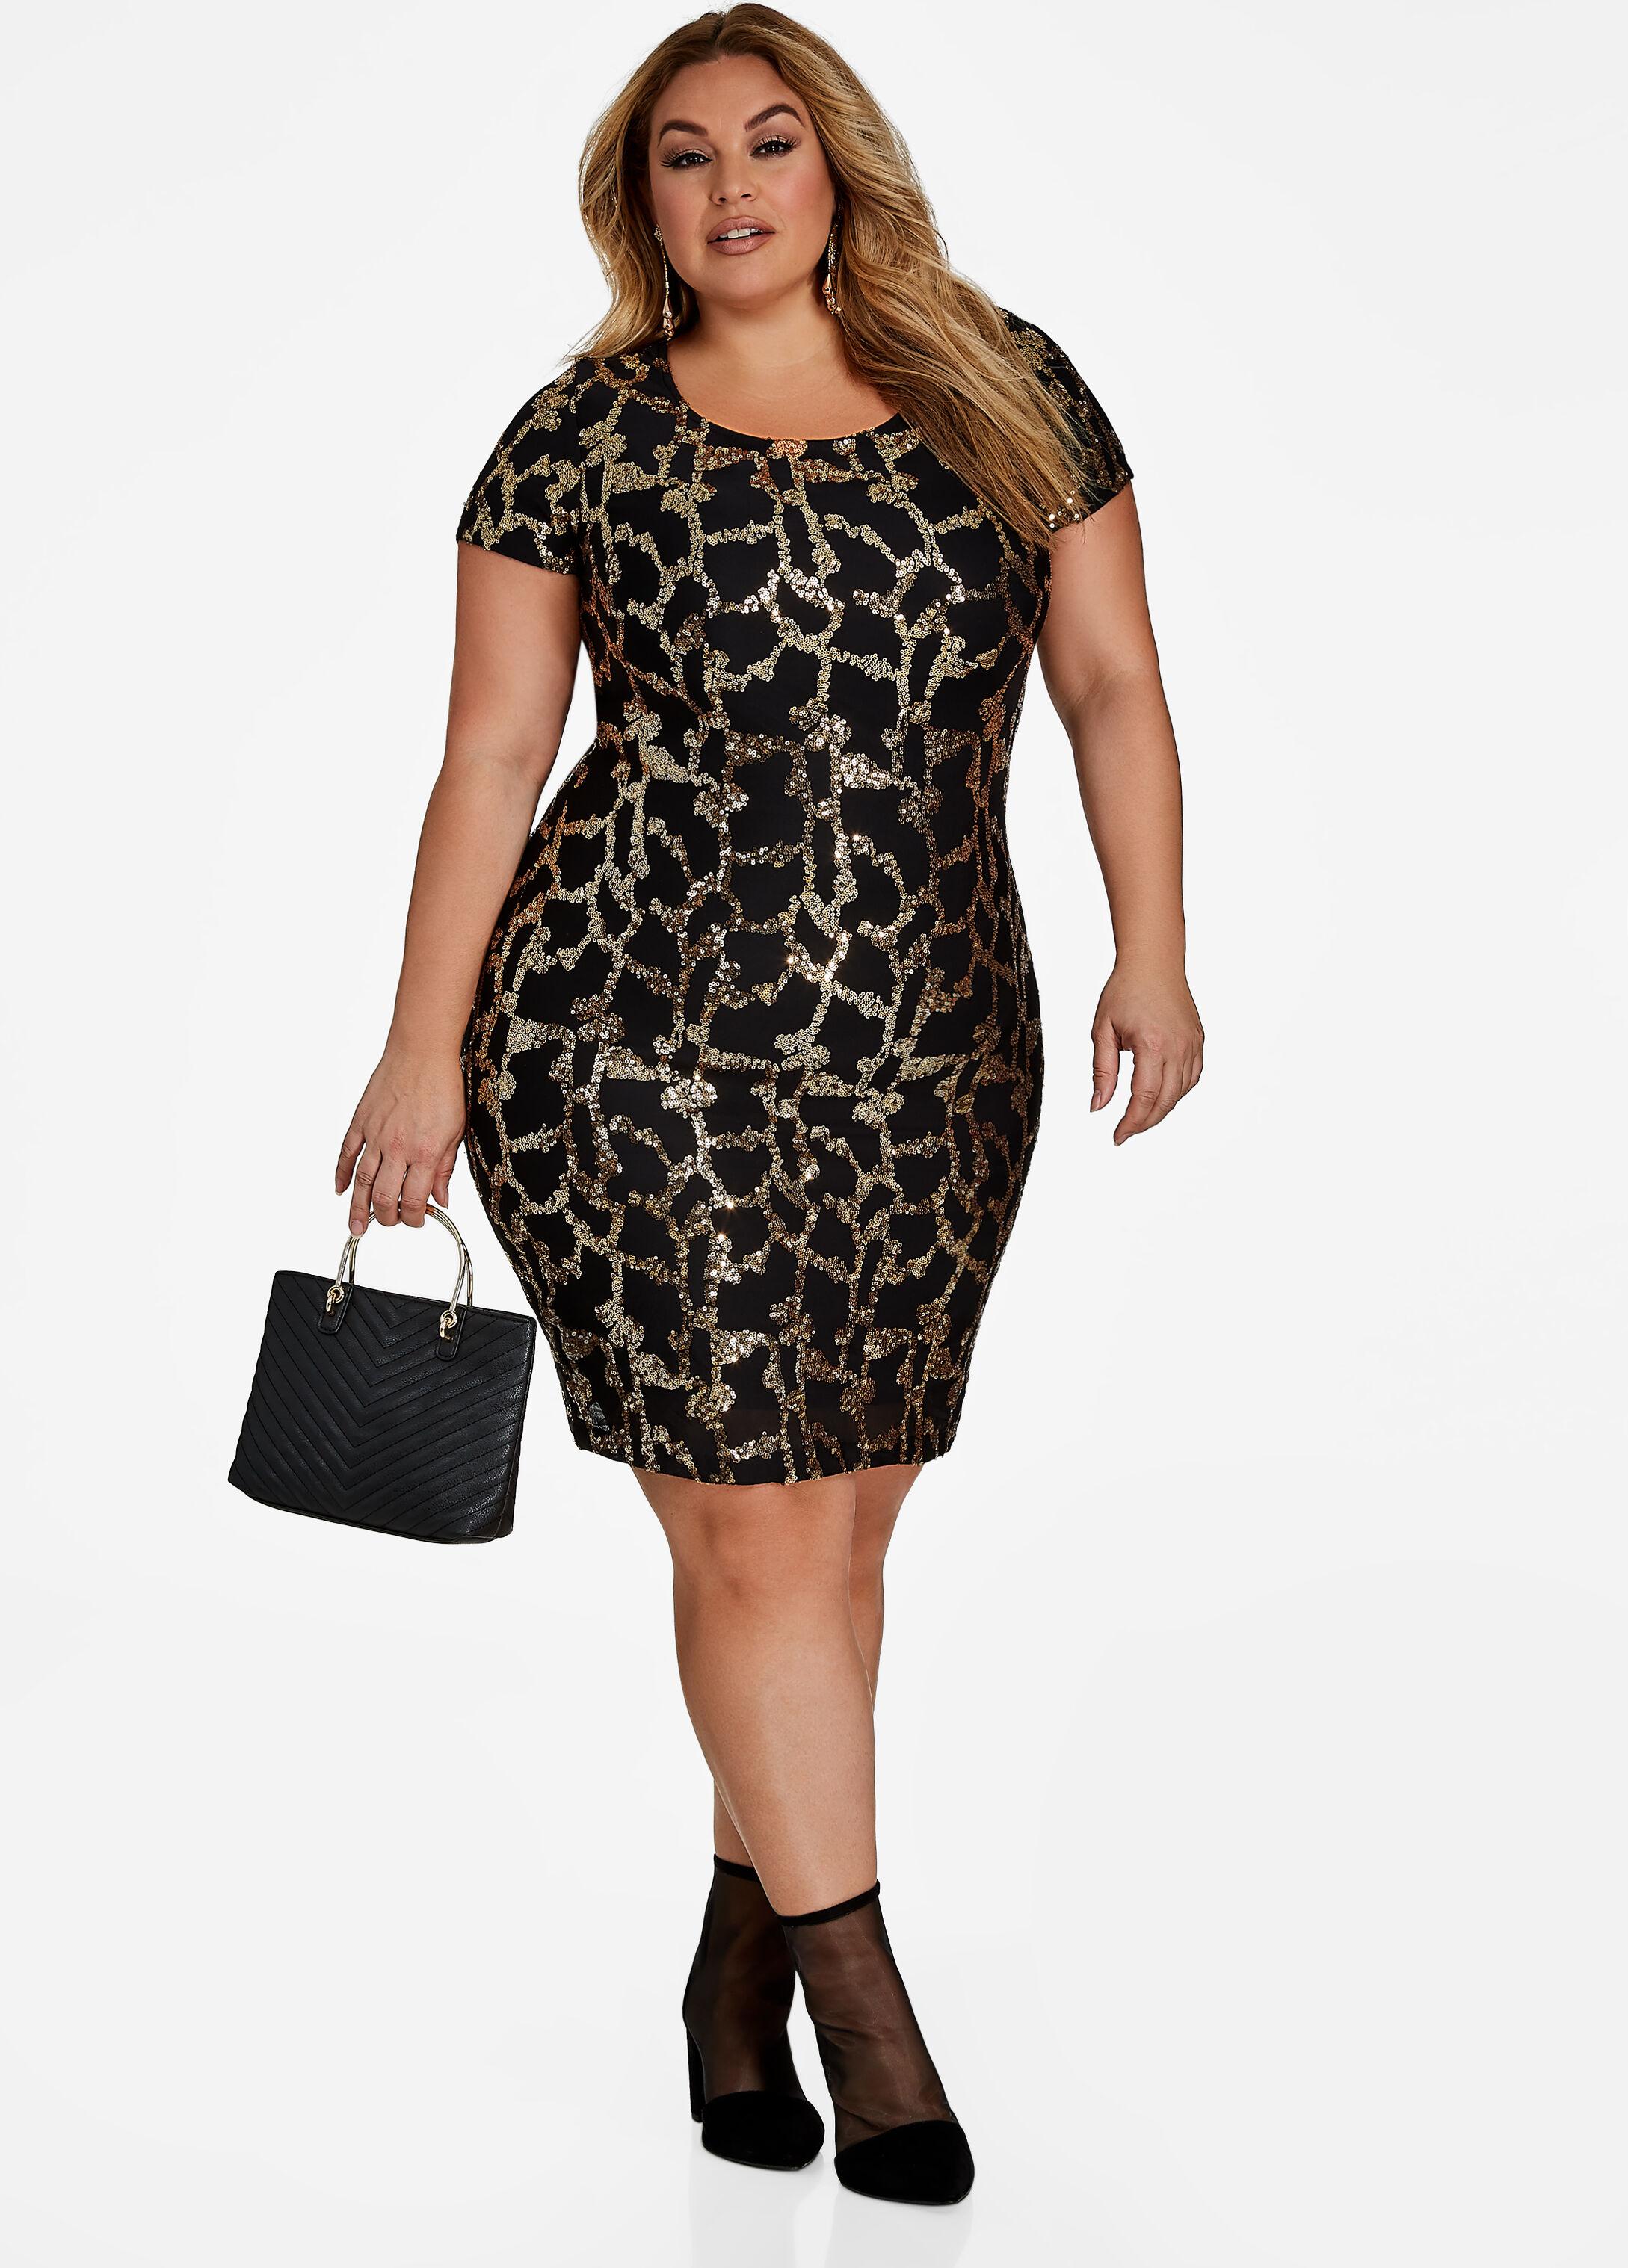 Sequin Animal Pattern Bodycon Dress